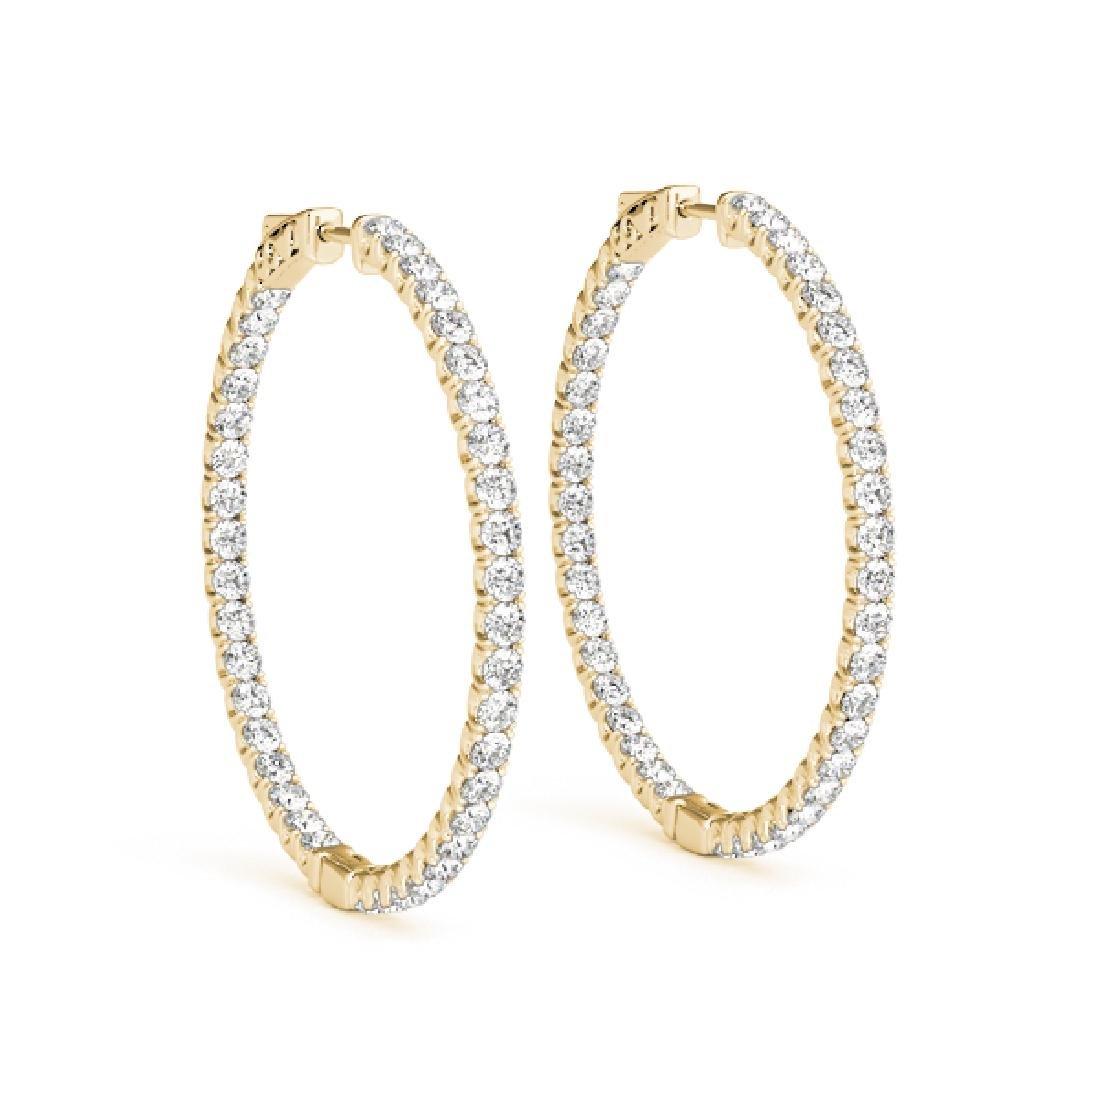 4.5 CTW Diamond VS/SI Certified 40 Mm Hoop Earrings 14K - 2